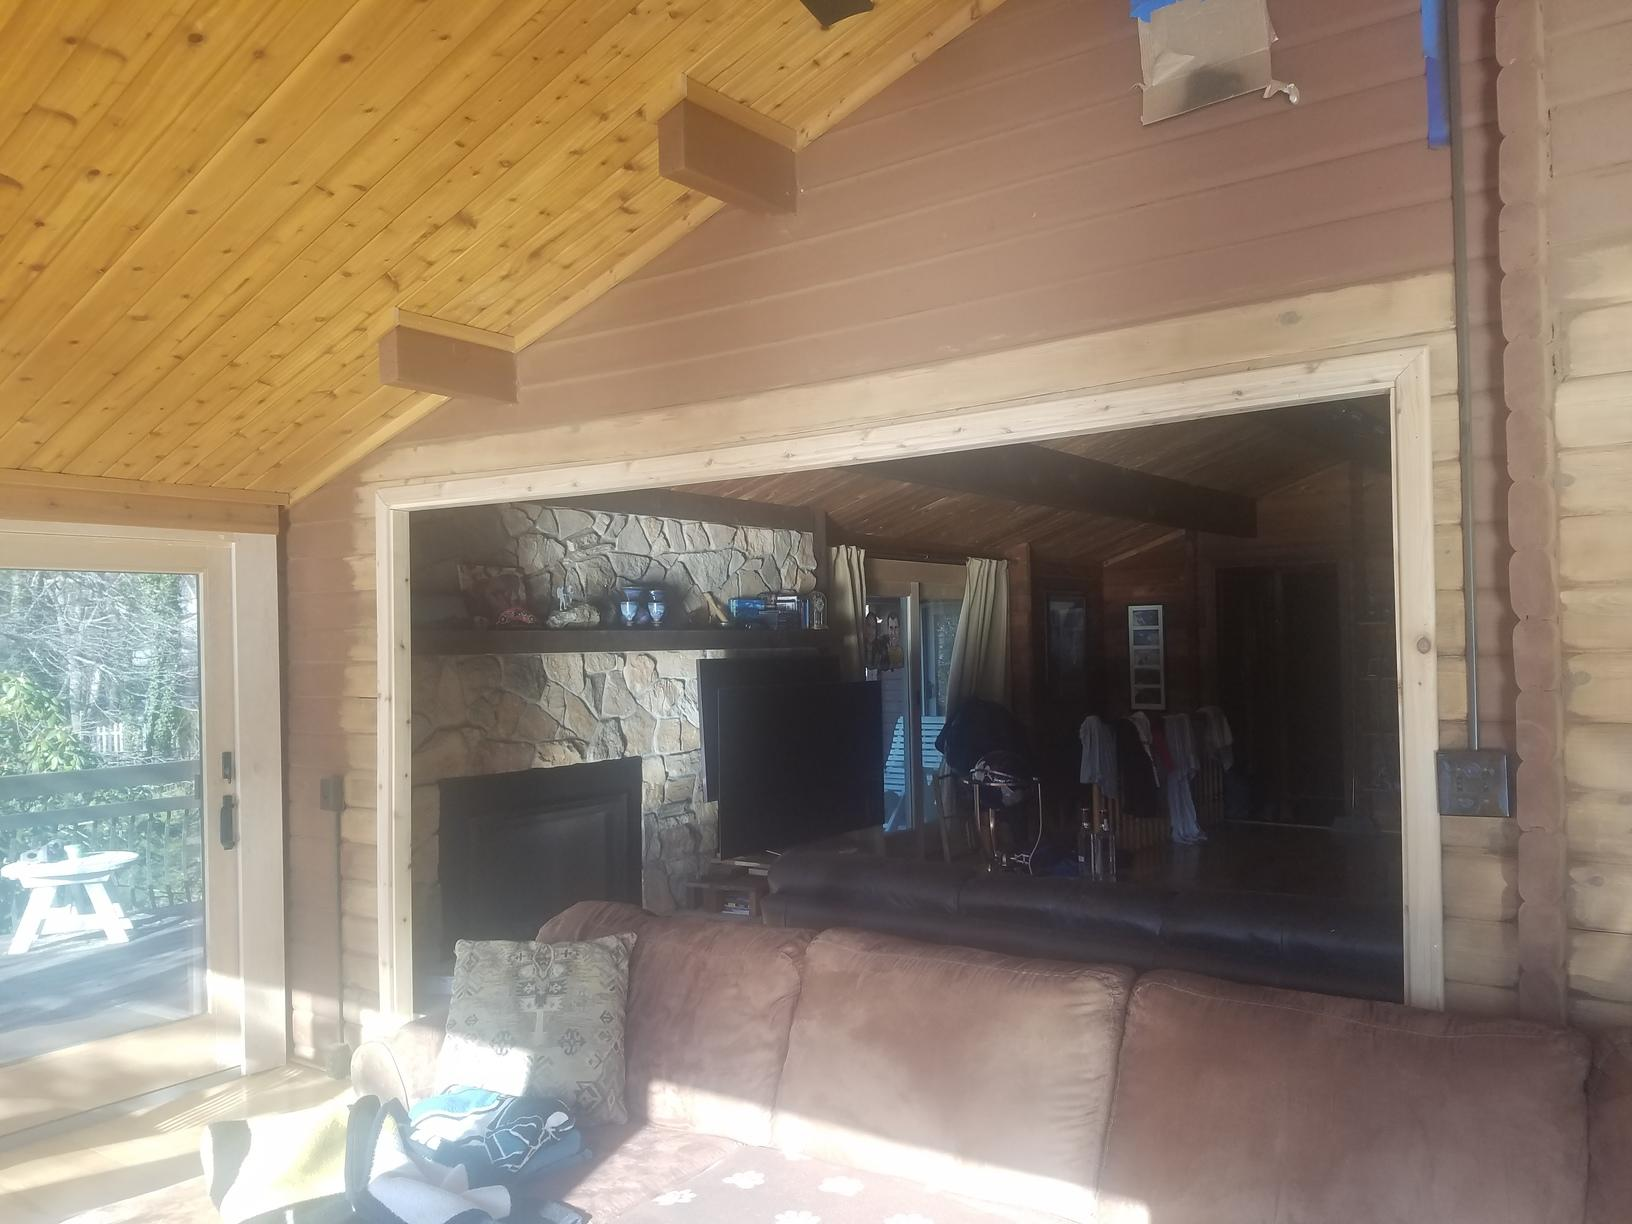 Opening Up Doorway to Sunroom